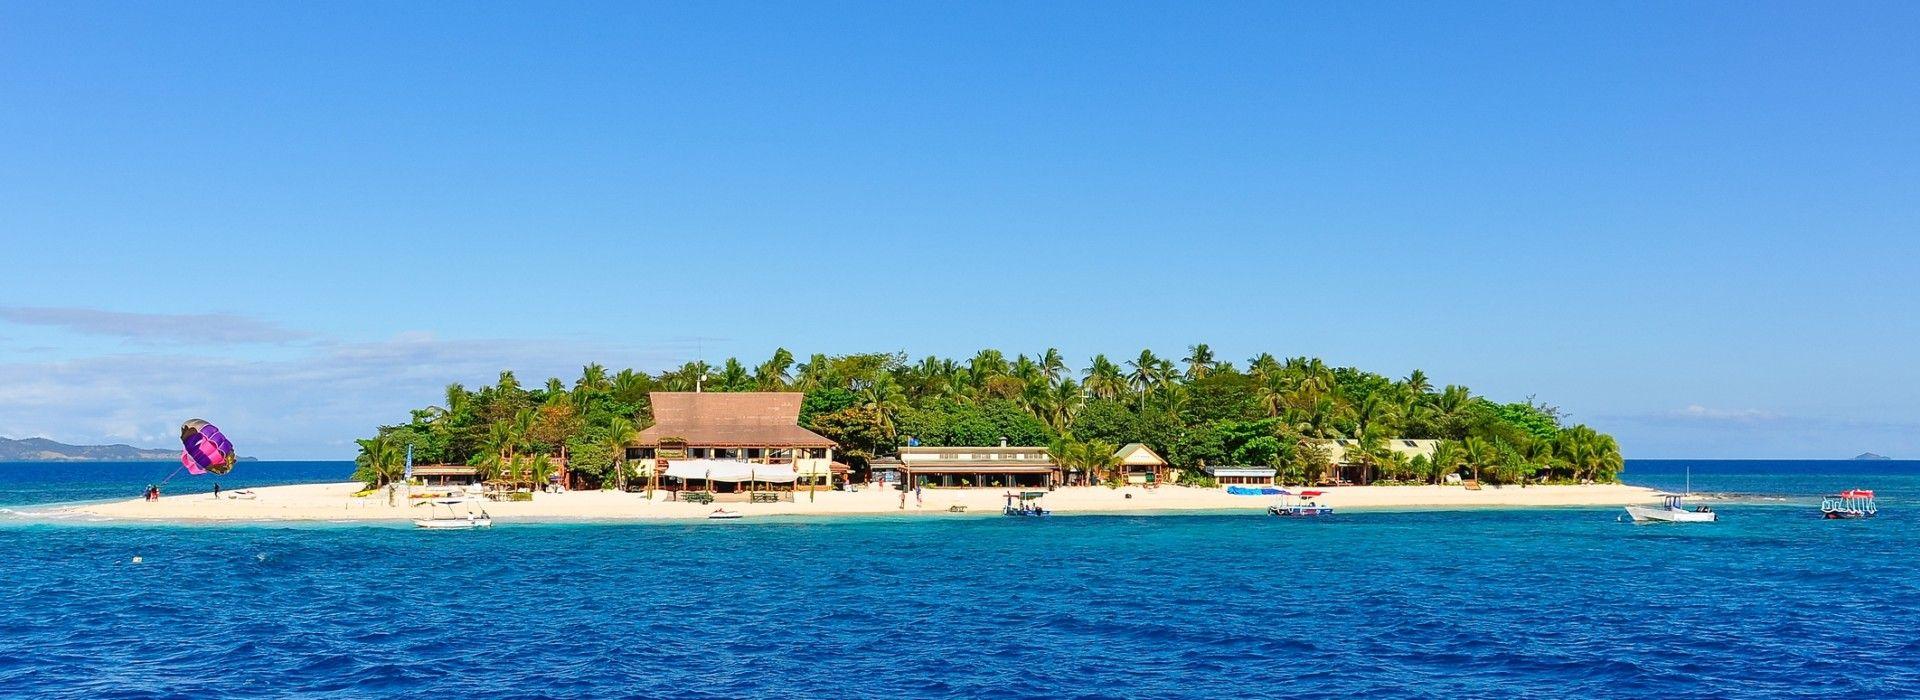 Beaches Tours in Oceania